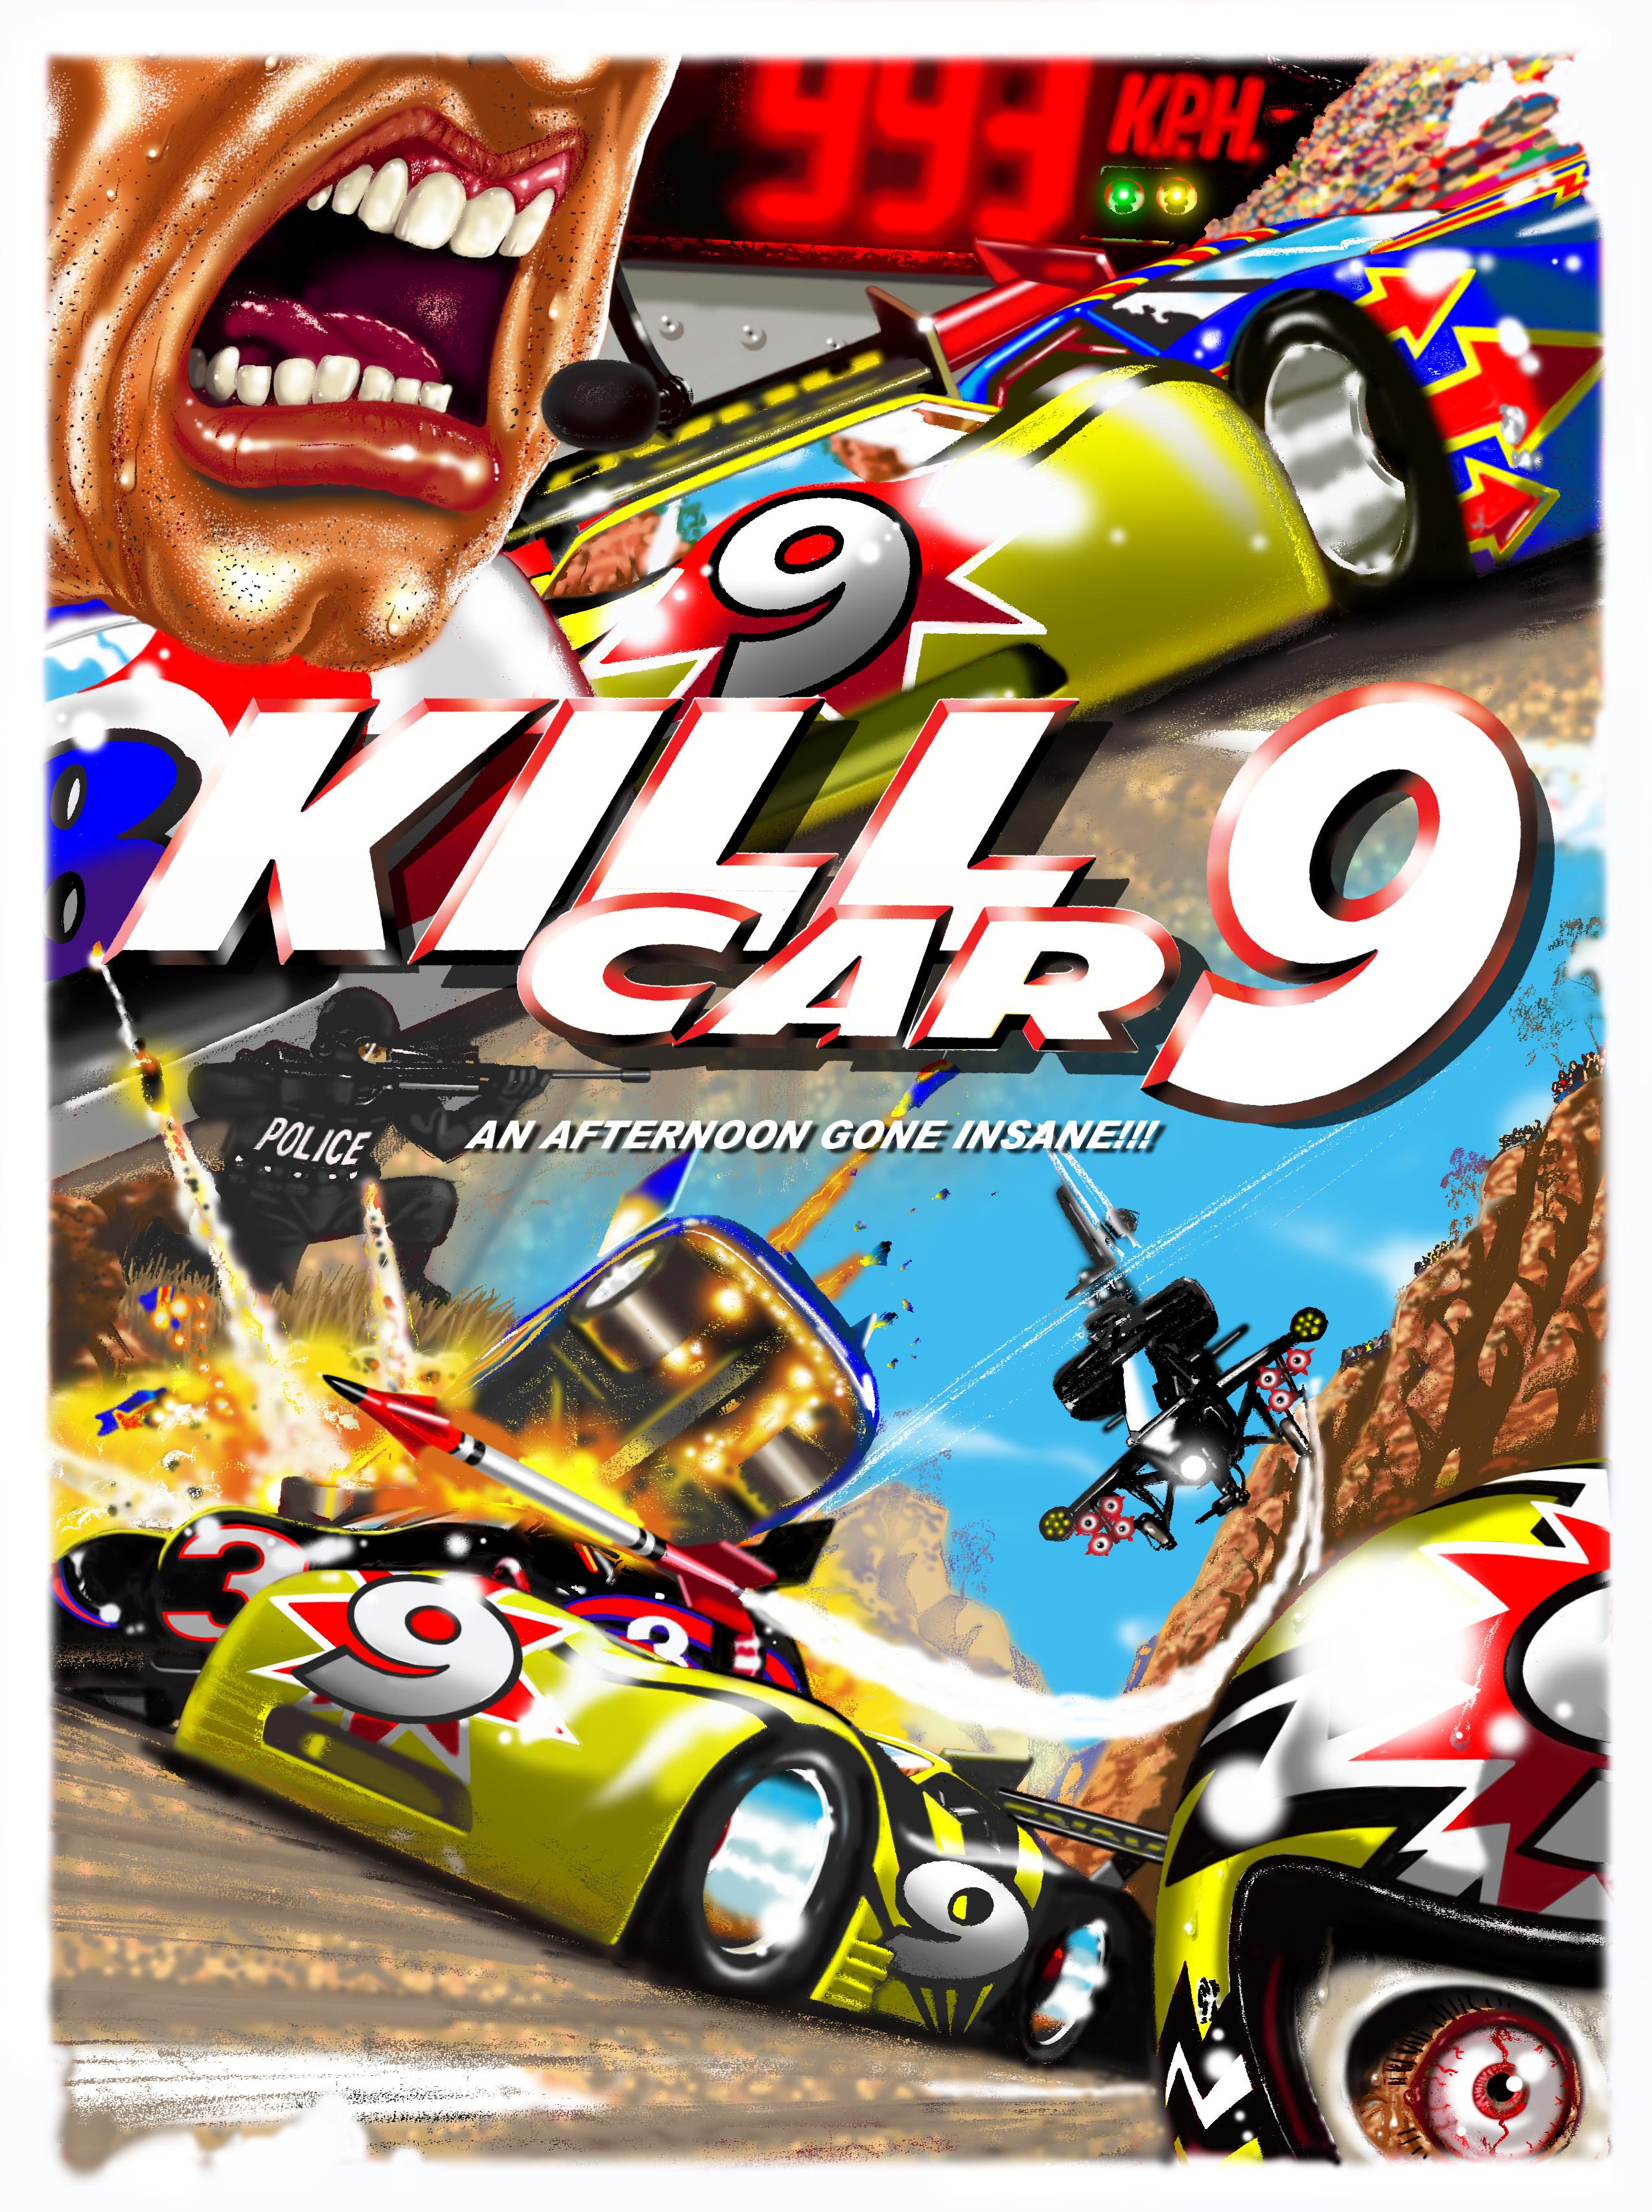 KC9 Poster Concept 2017